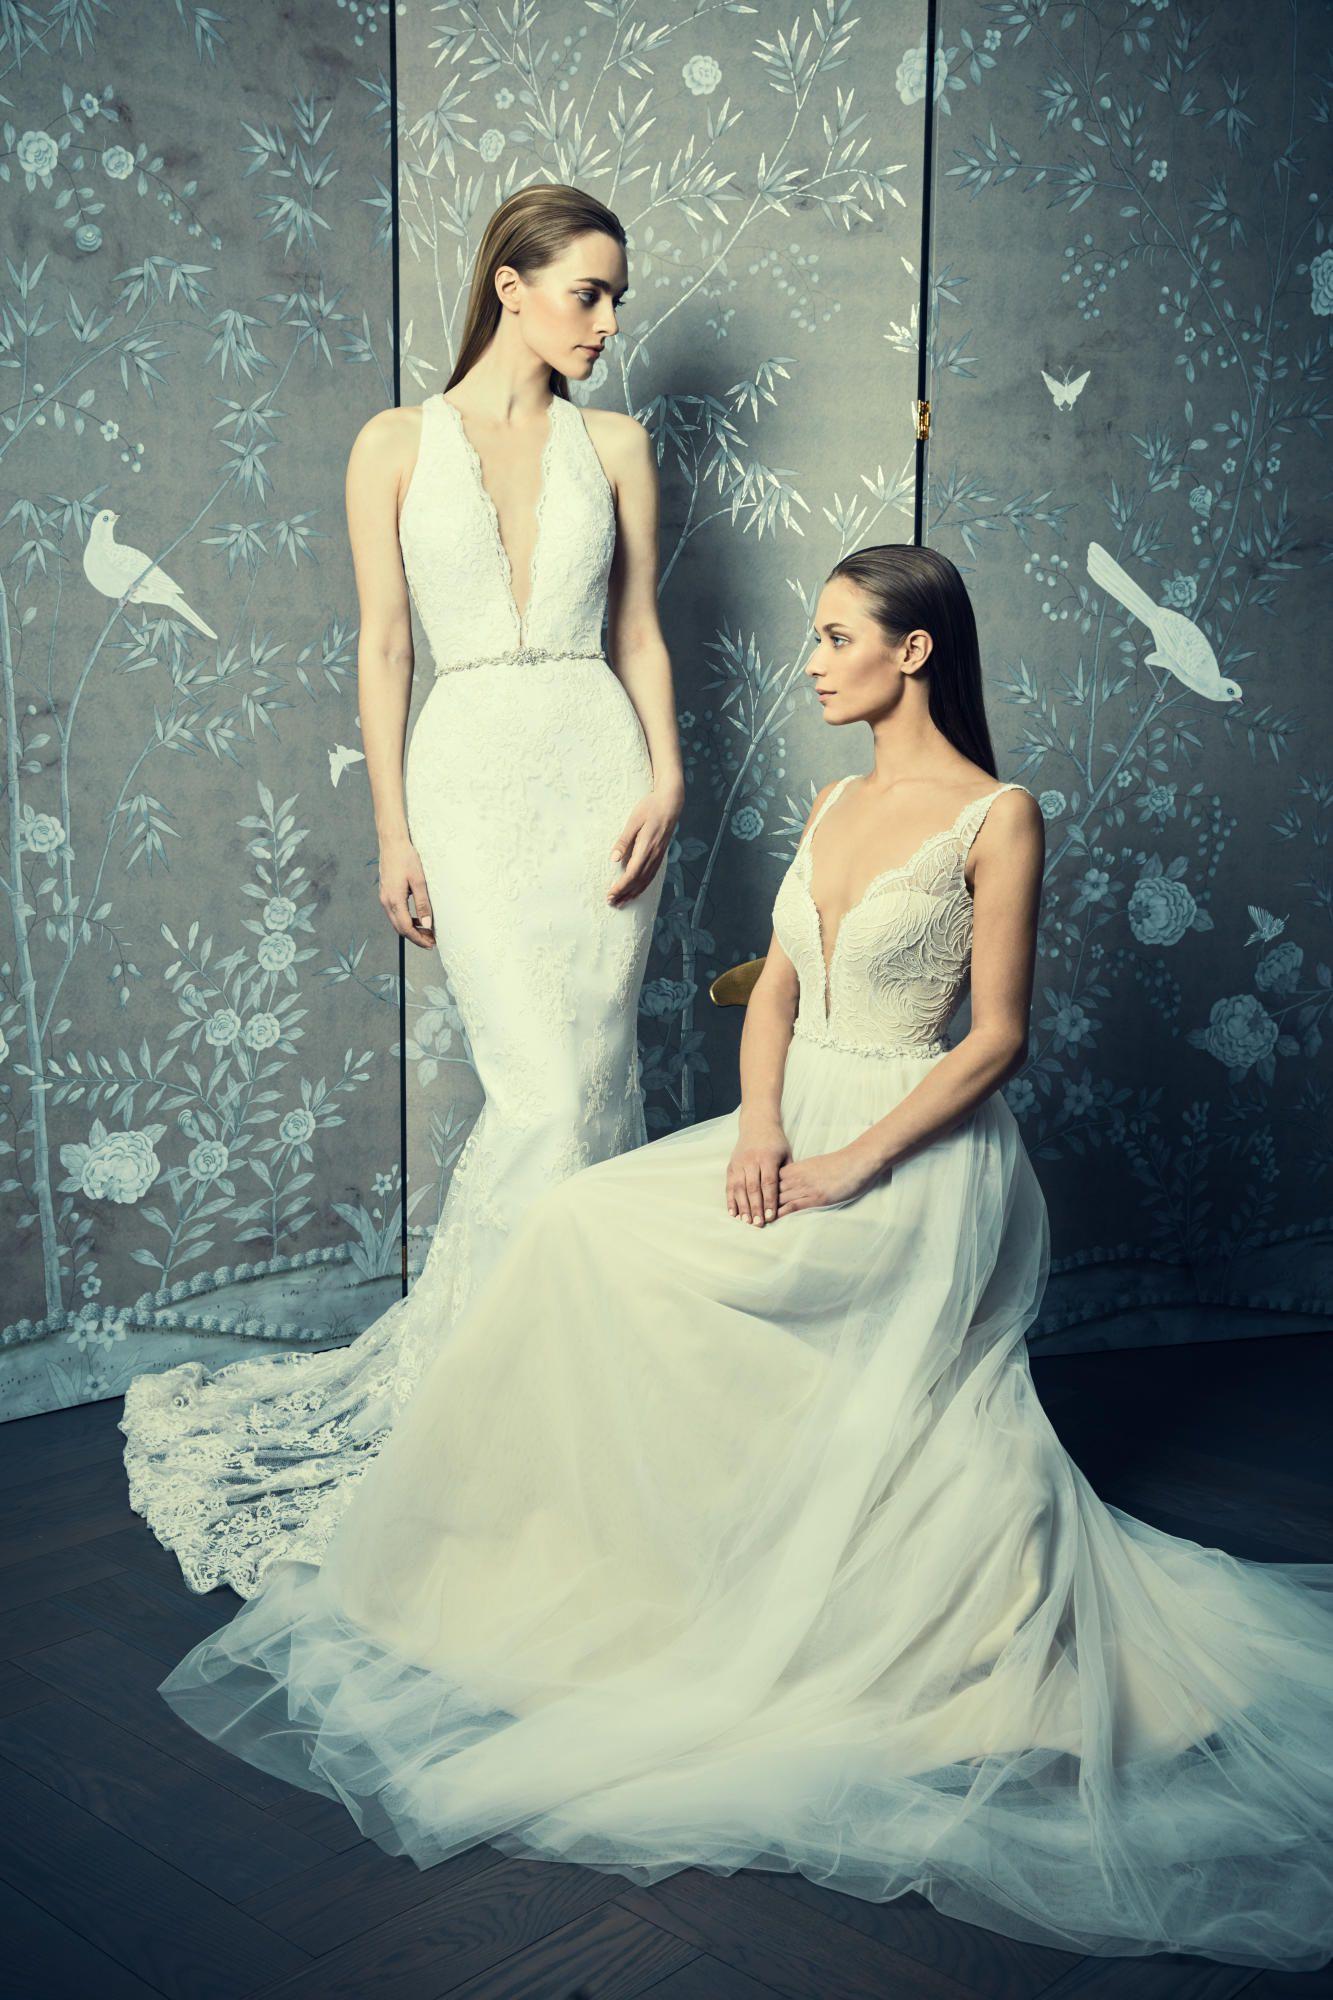 legends-romona-keveza-spring-2018-gowns-jeweled-belts Tendências de vestidos de noiva para 2018